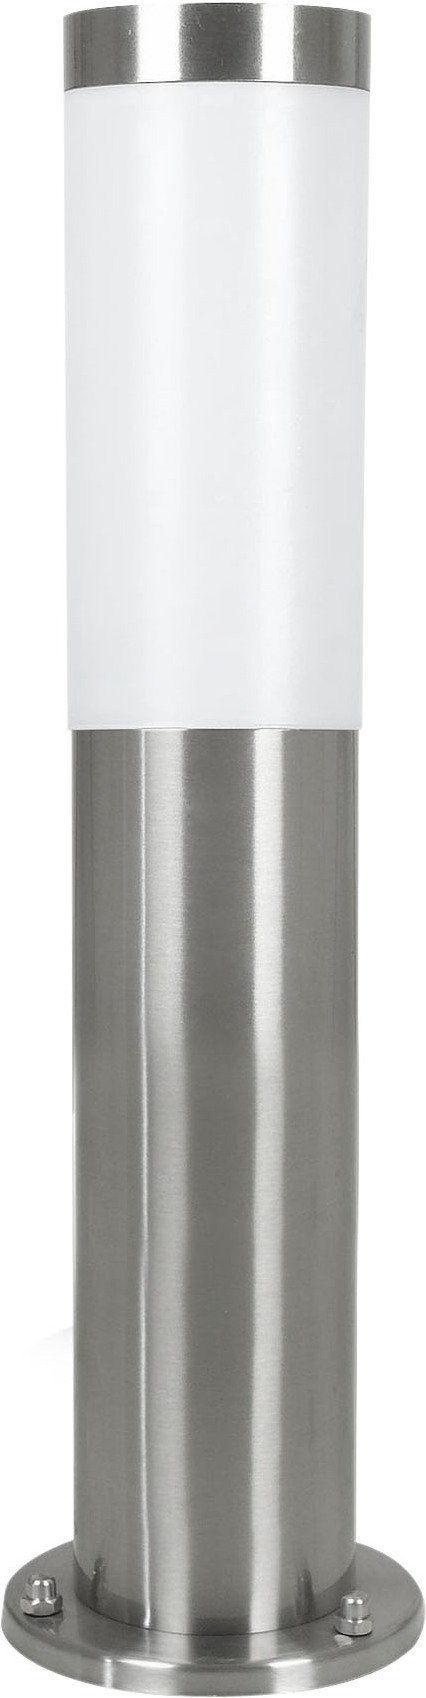 Lampa stojąca 1X15W E27 81751 HELSINKI IP44 EGLO